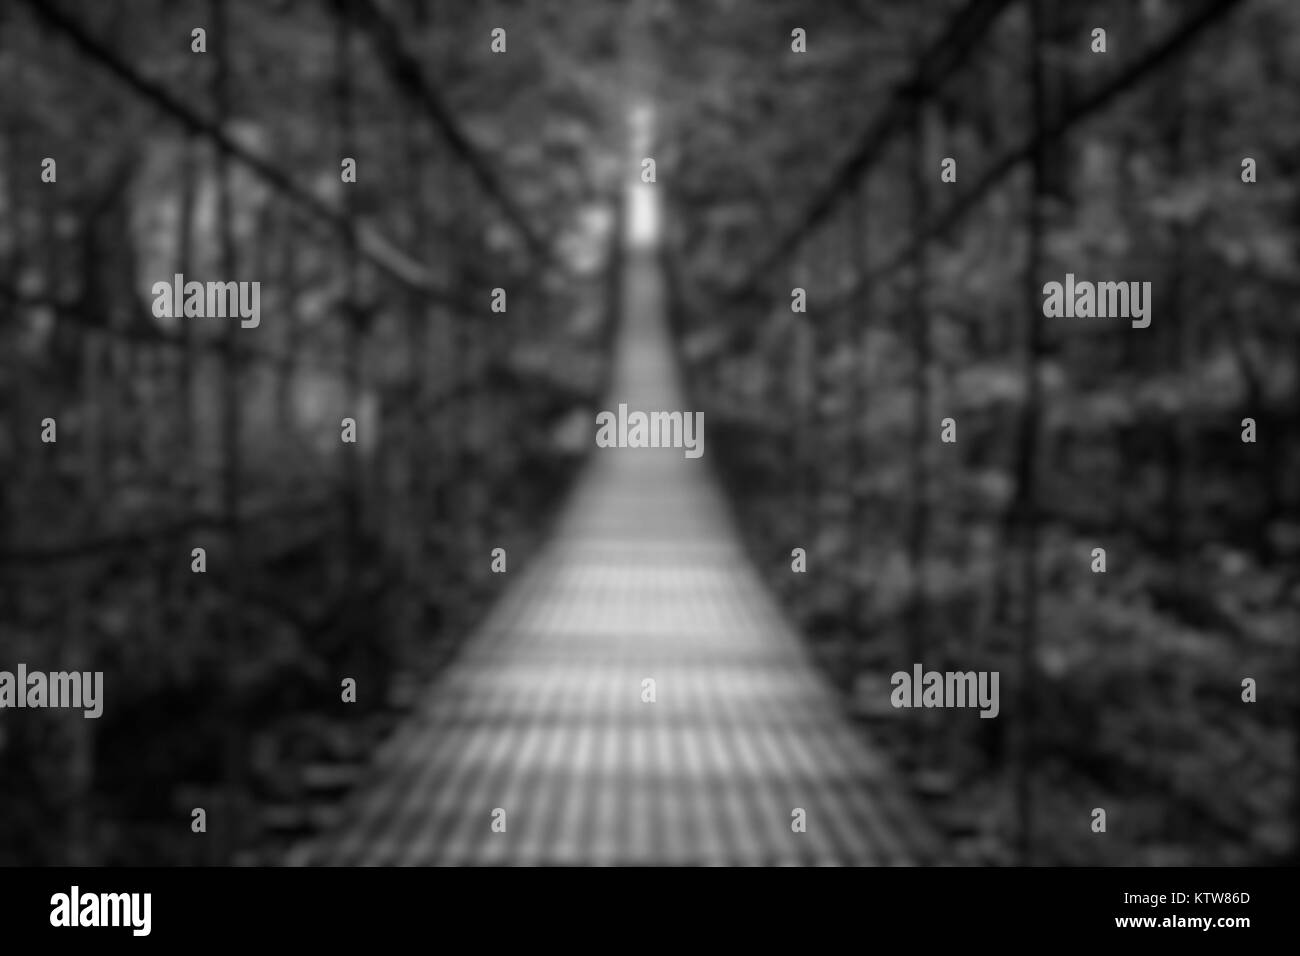 suspension bridge, blurred background - Stock Image